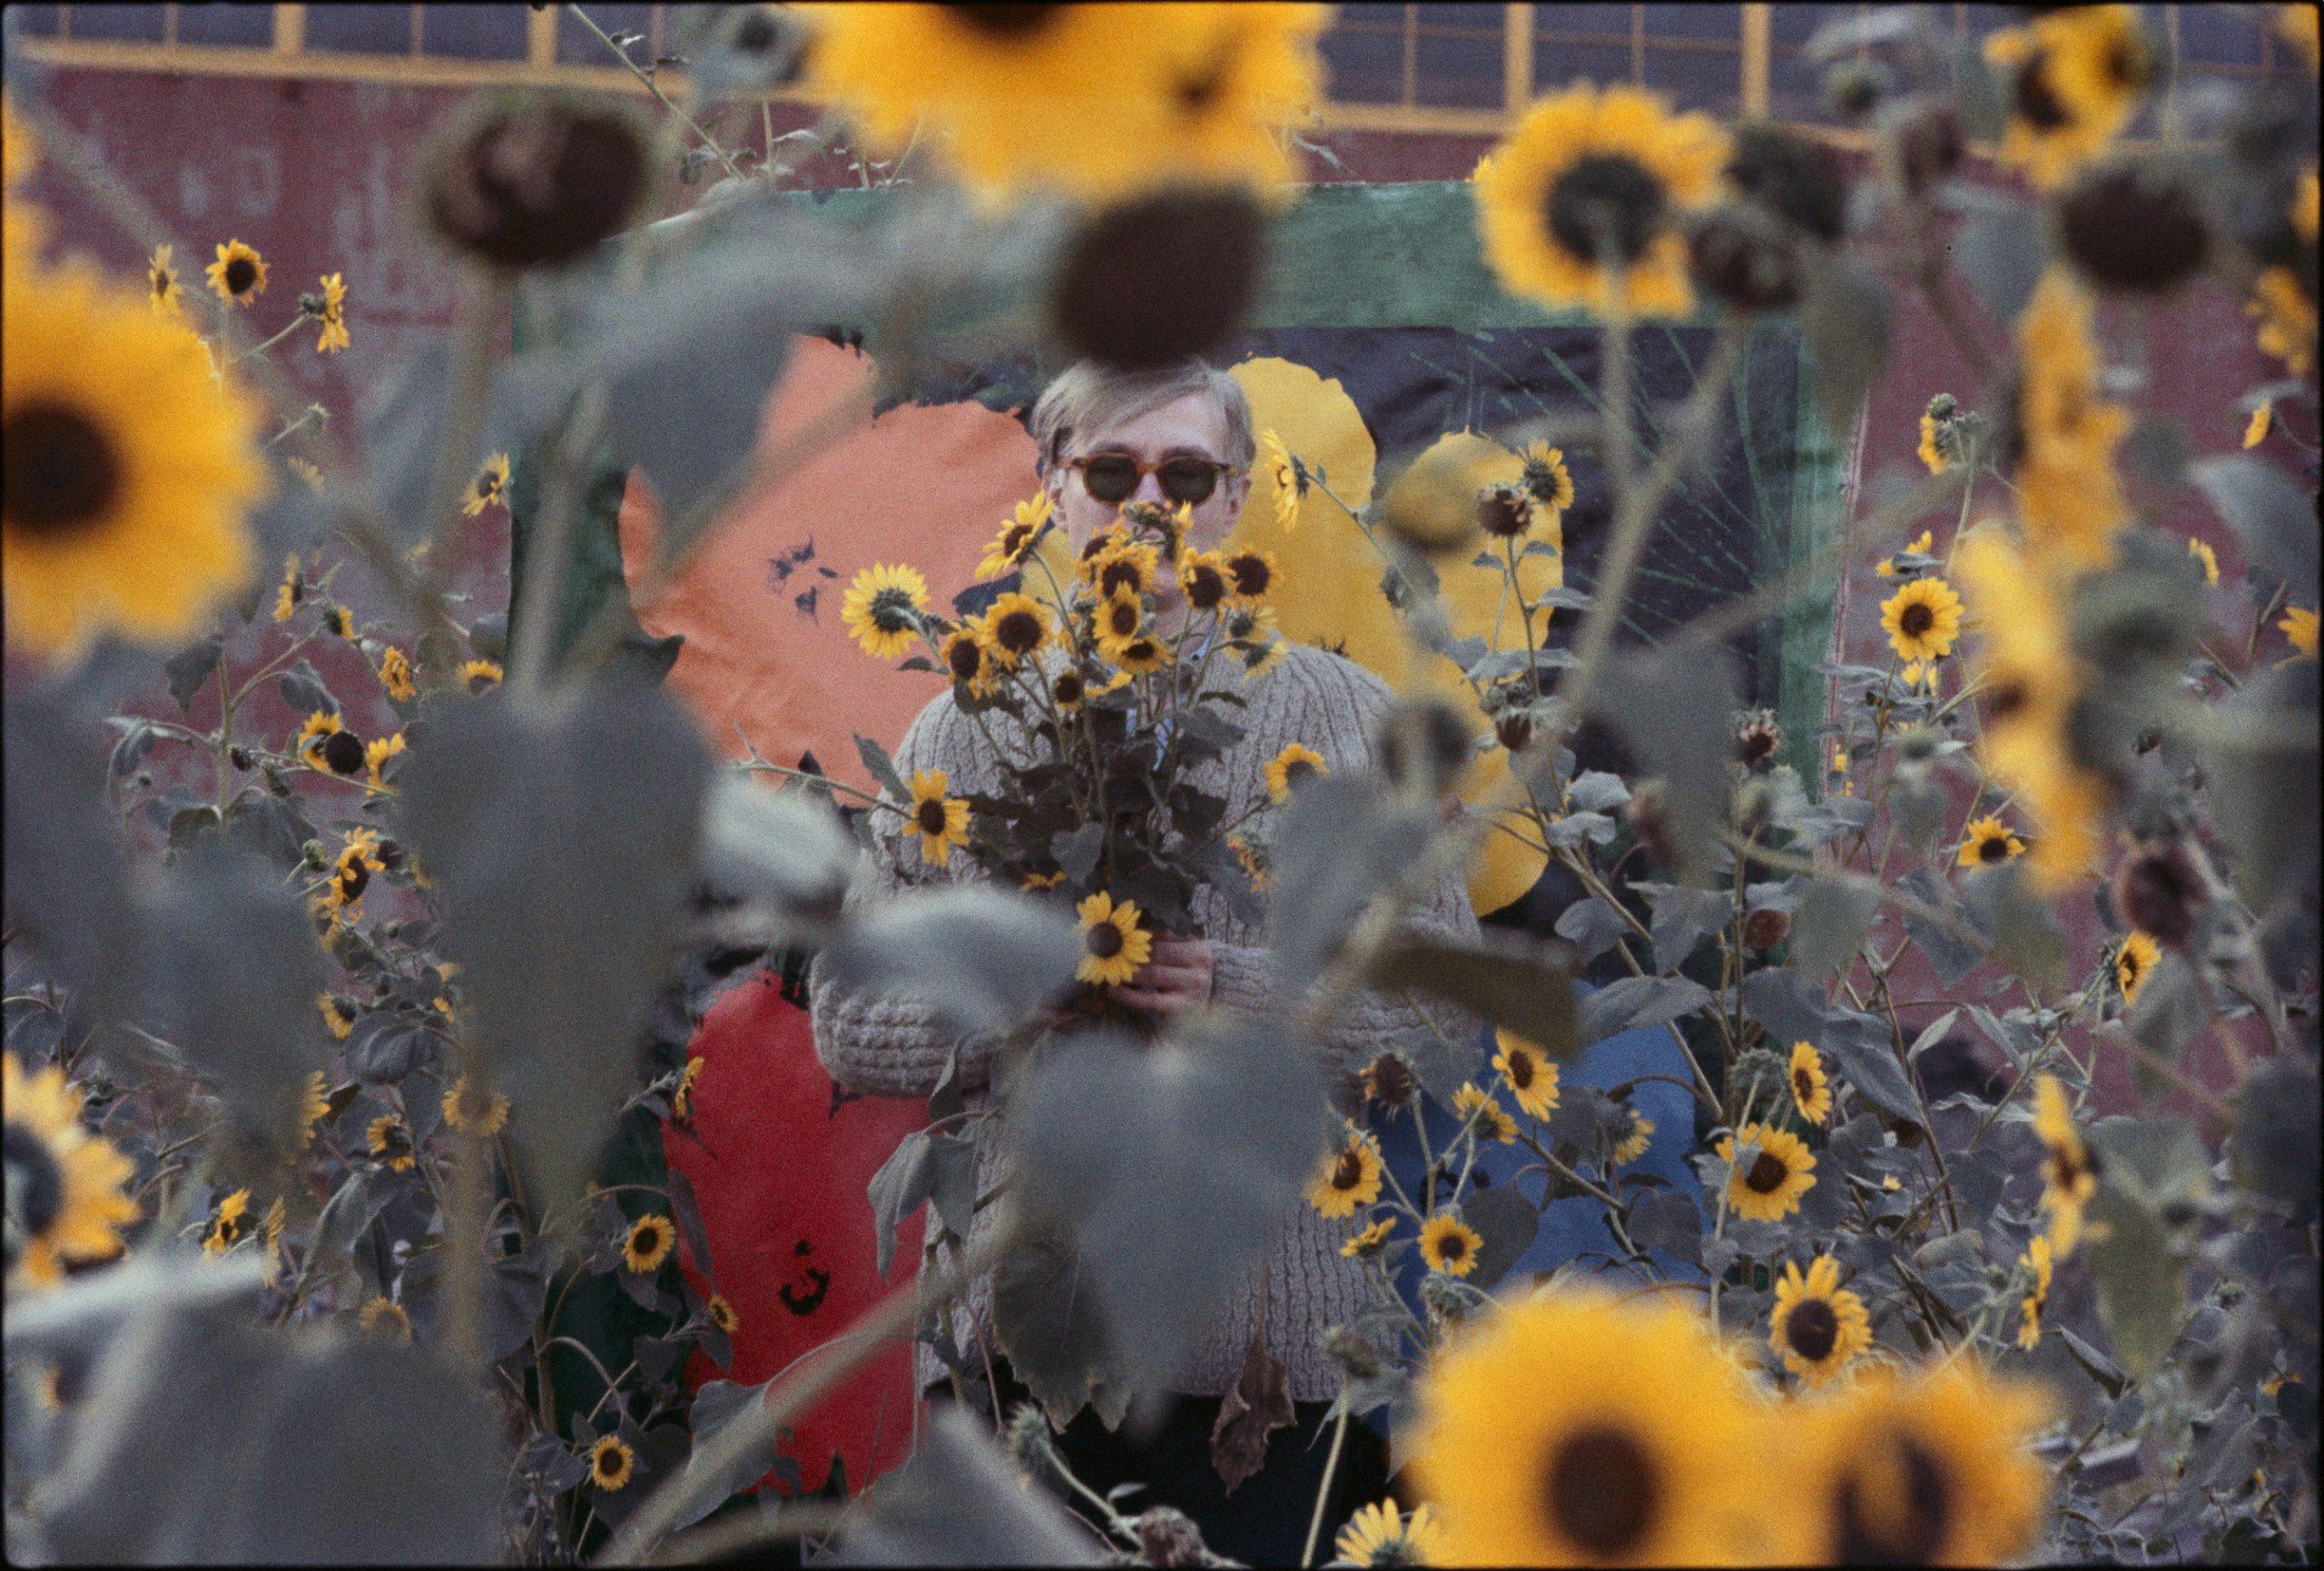 Warhol Flowers XVI